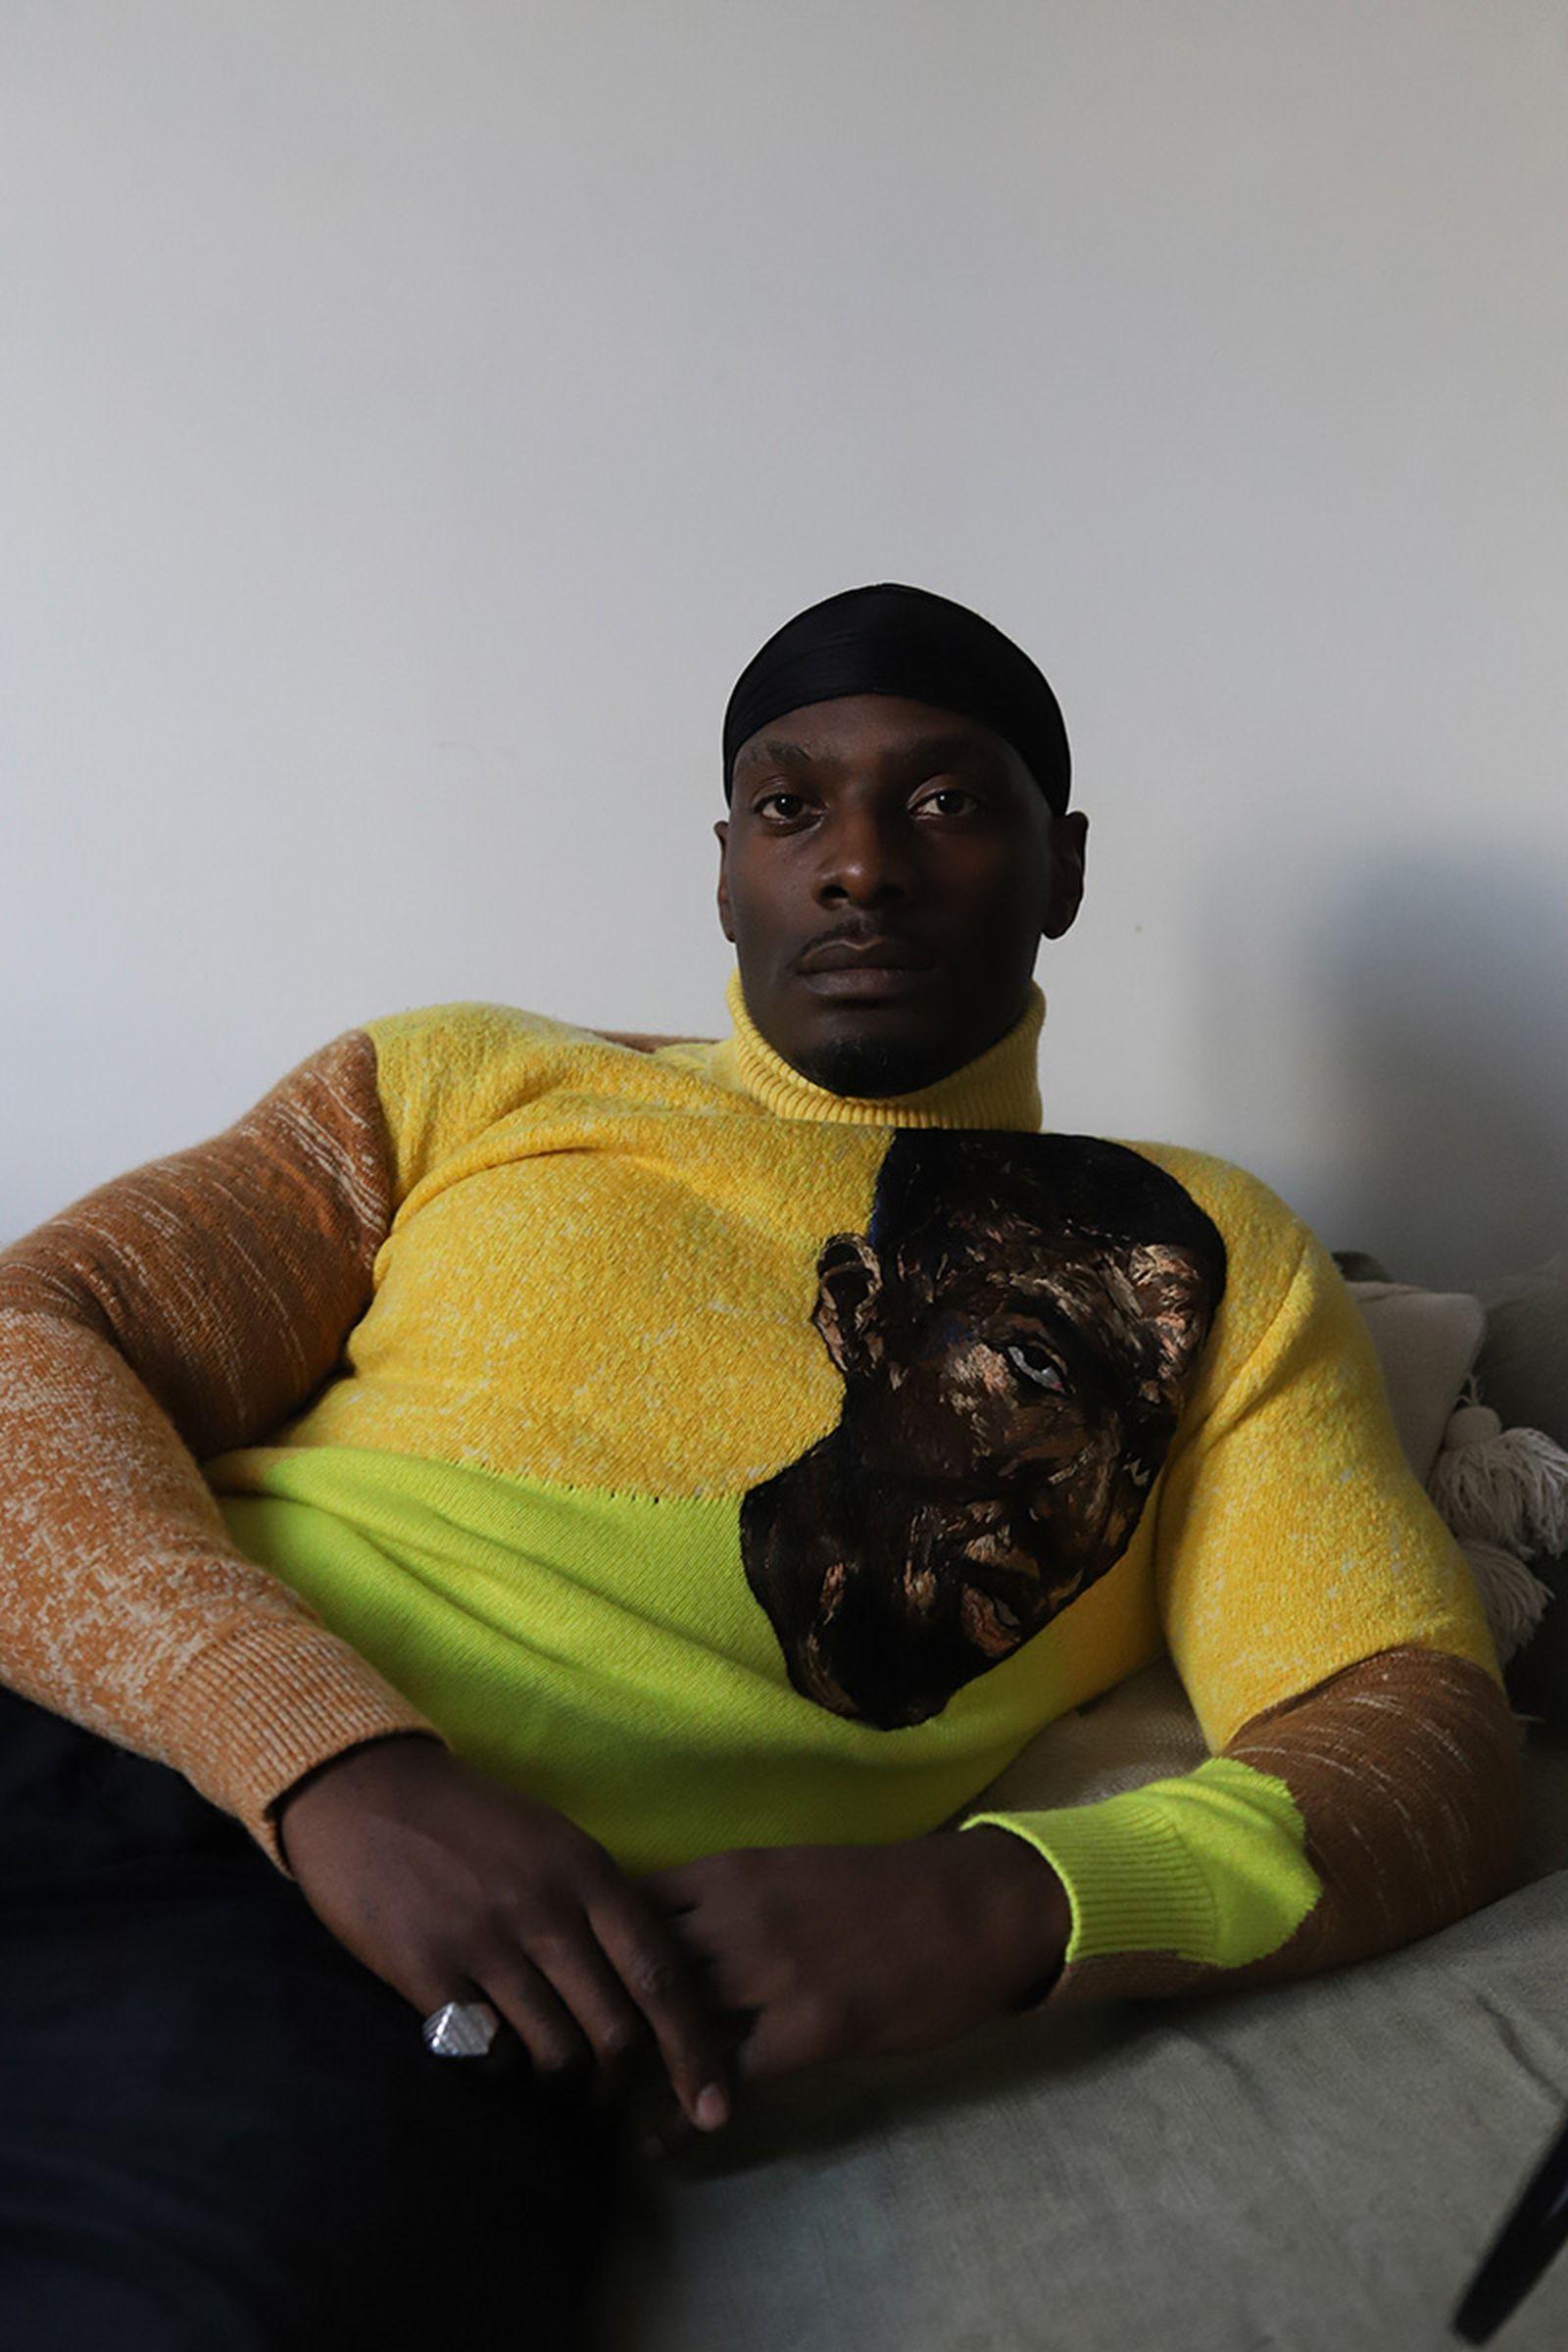 turtleneck cashmere jumper & pants  DIOR & AMOAKO BOAFO durag personal